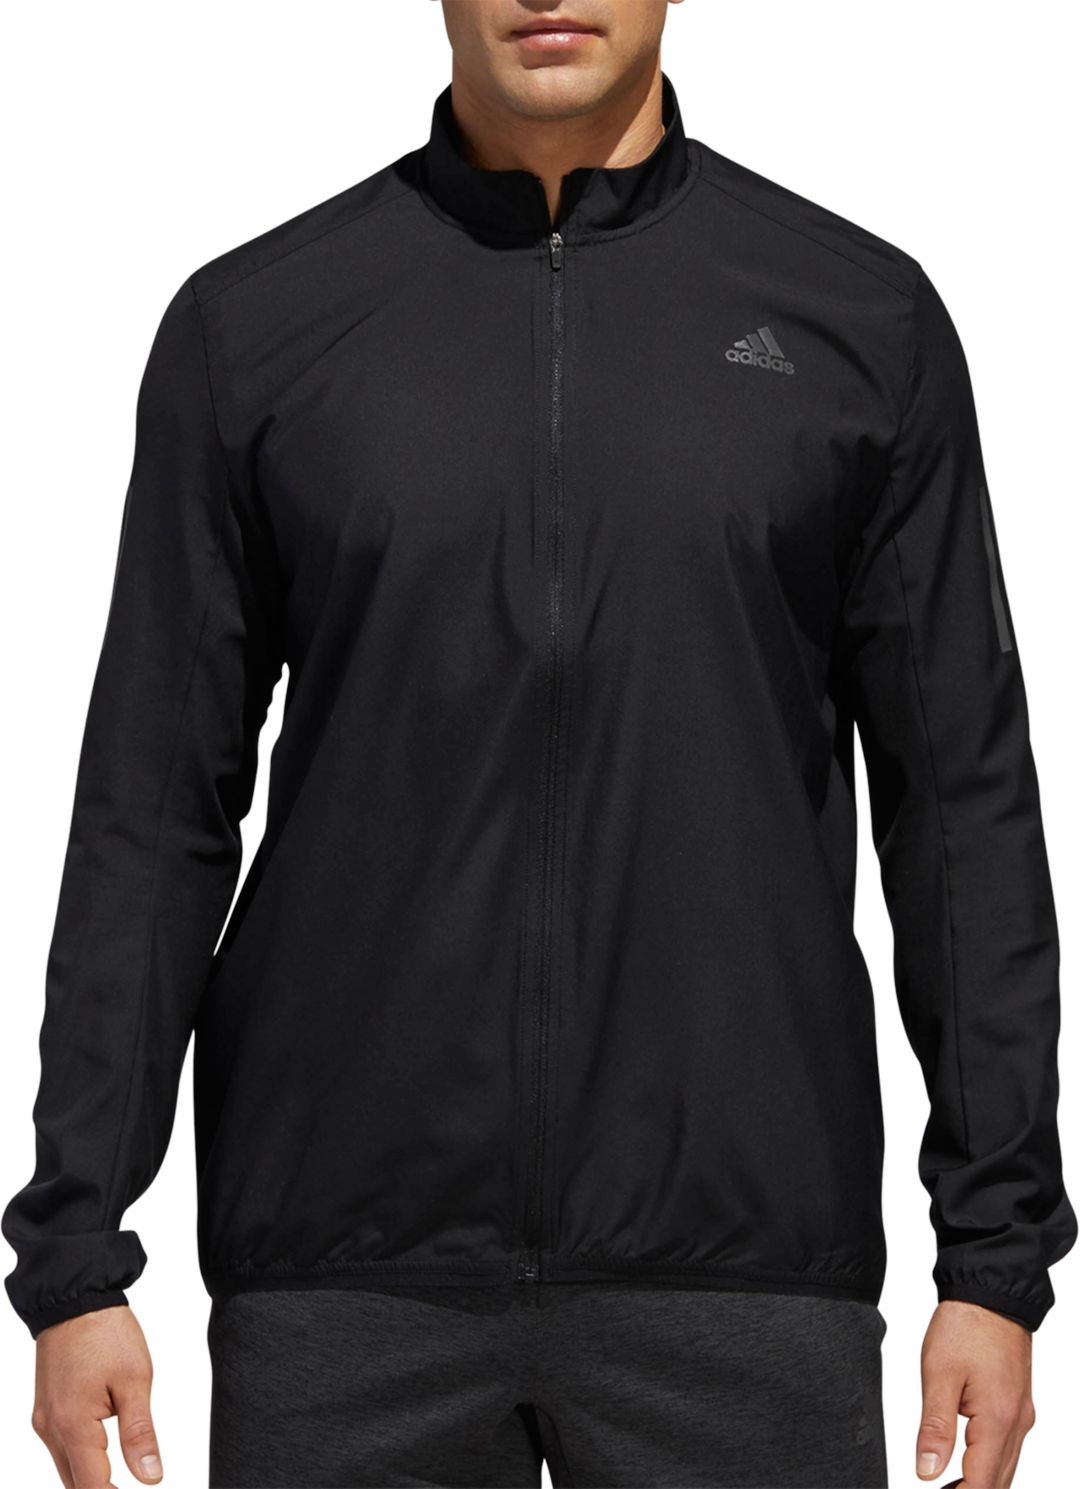 d570f36f2 adidas Men's Response Wind Running Jacket. noImageFound. Previous